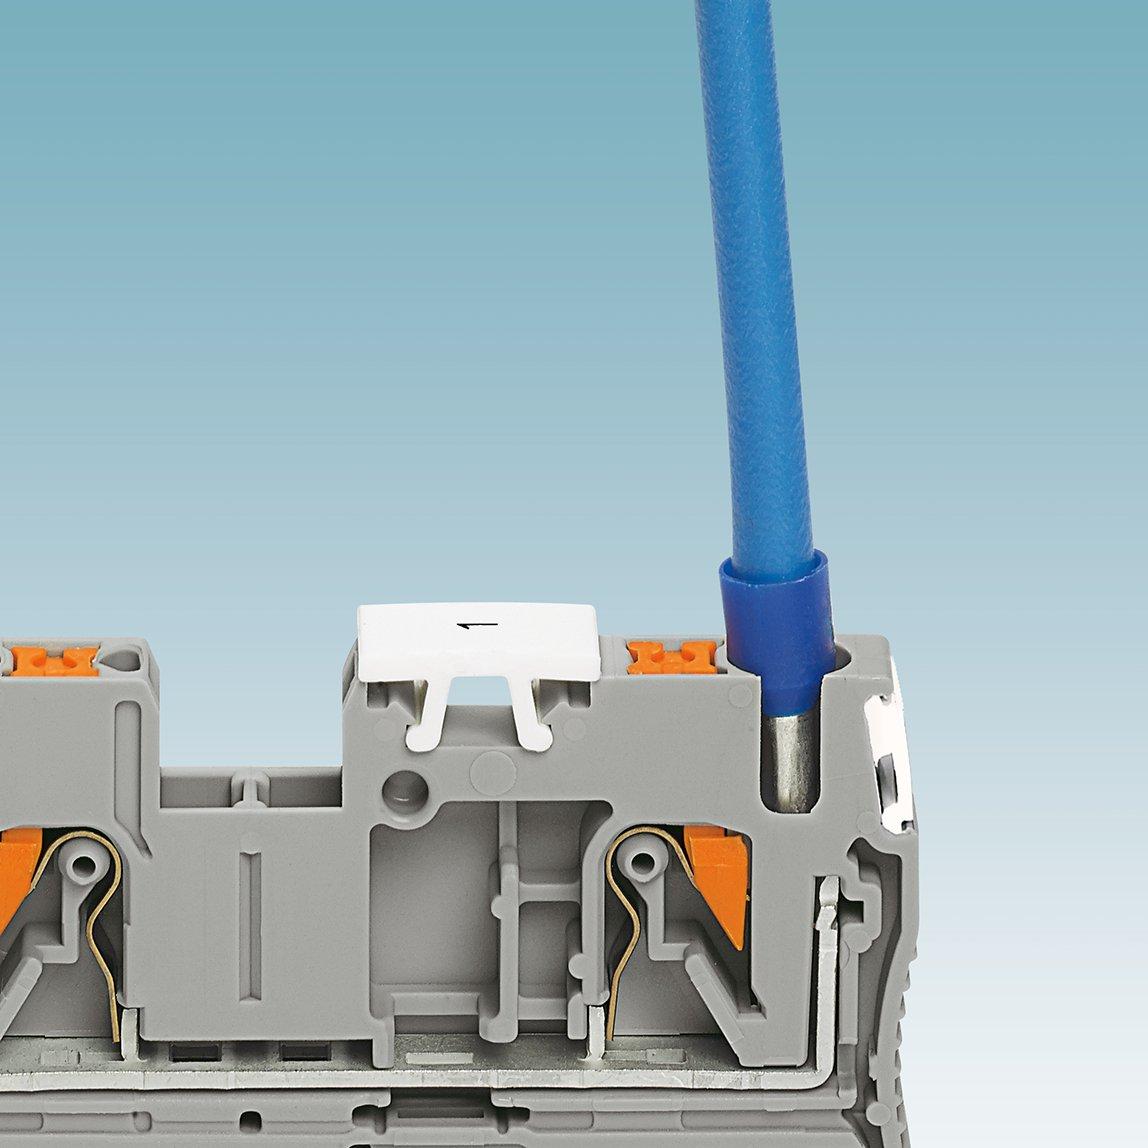 Phoenix Contact 3211797 bloque de terminales Gris Electrical terminal block 6,2 mm, 77 mm, 35,3 mm, 800 V